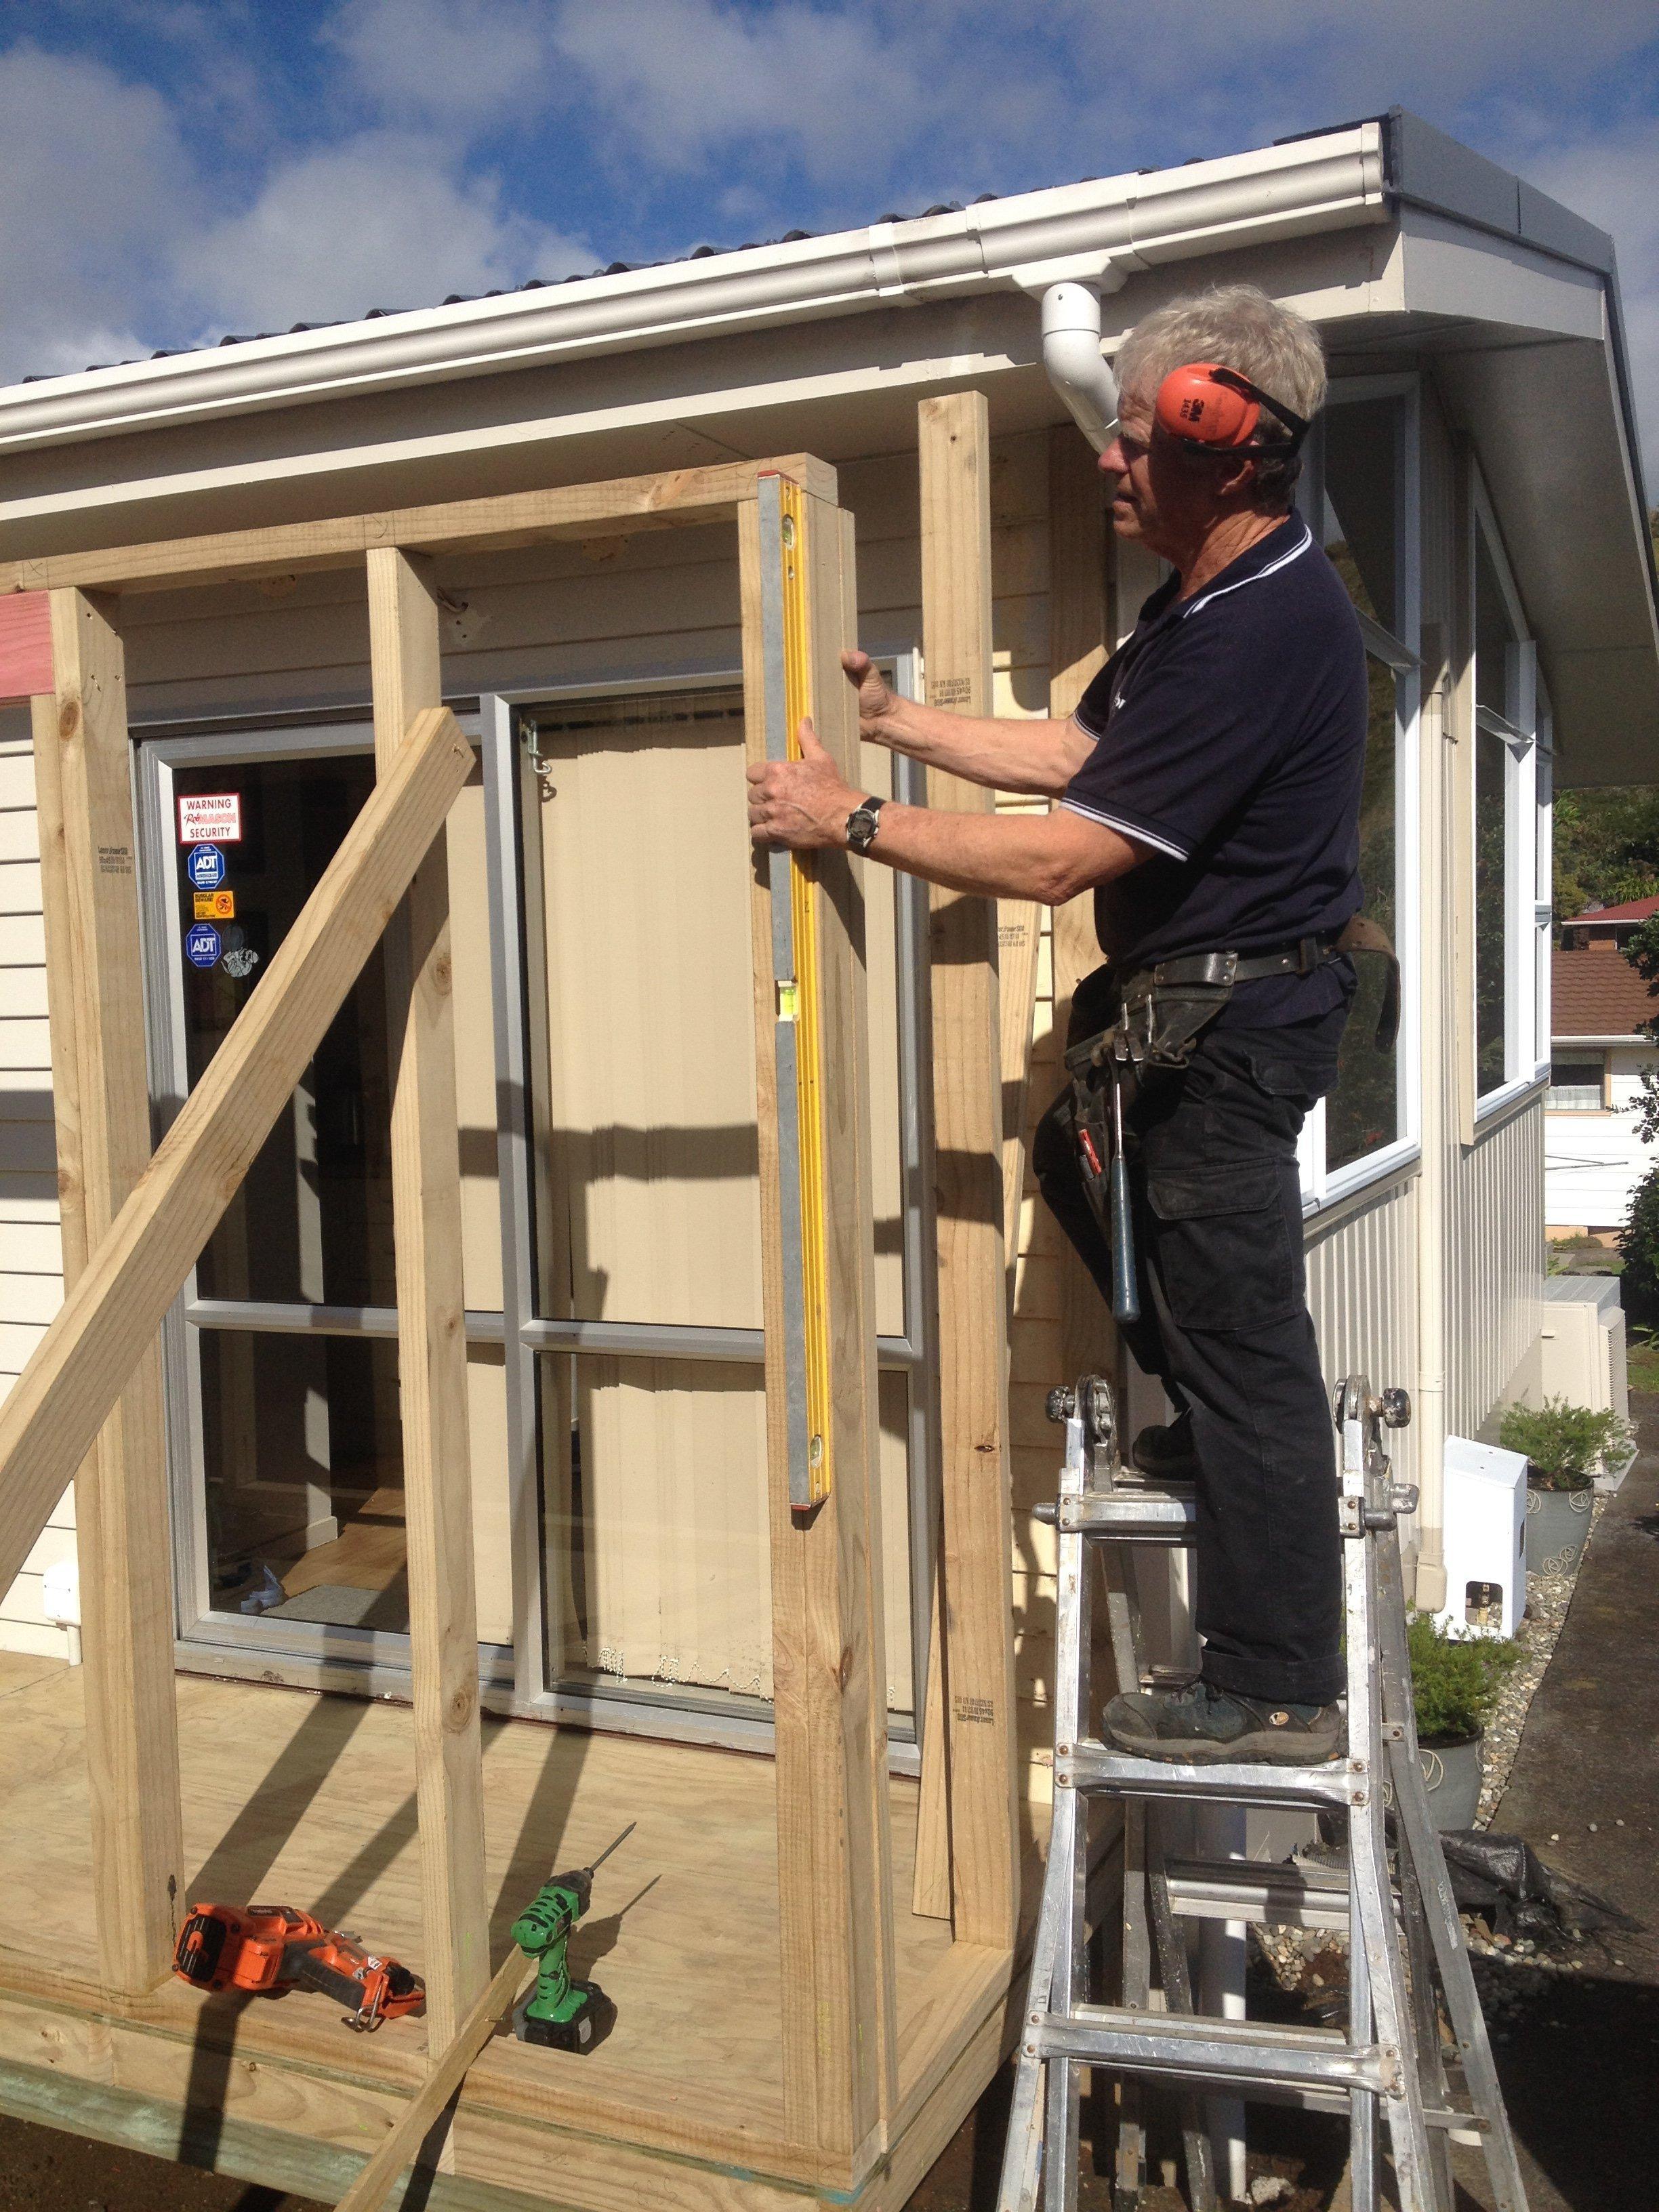 Professional handyman providing plumbing services in Waitara